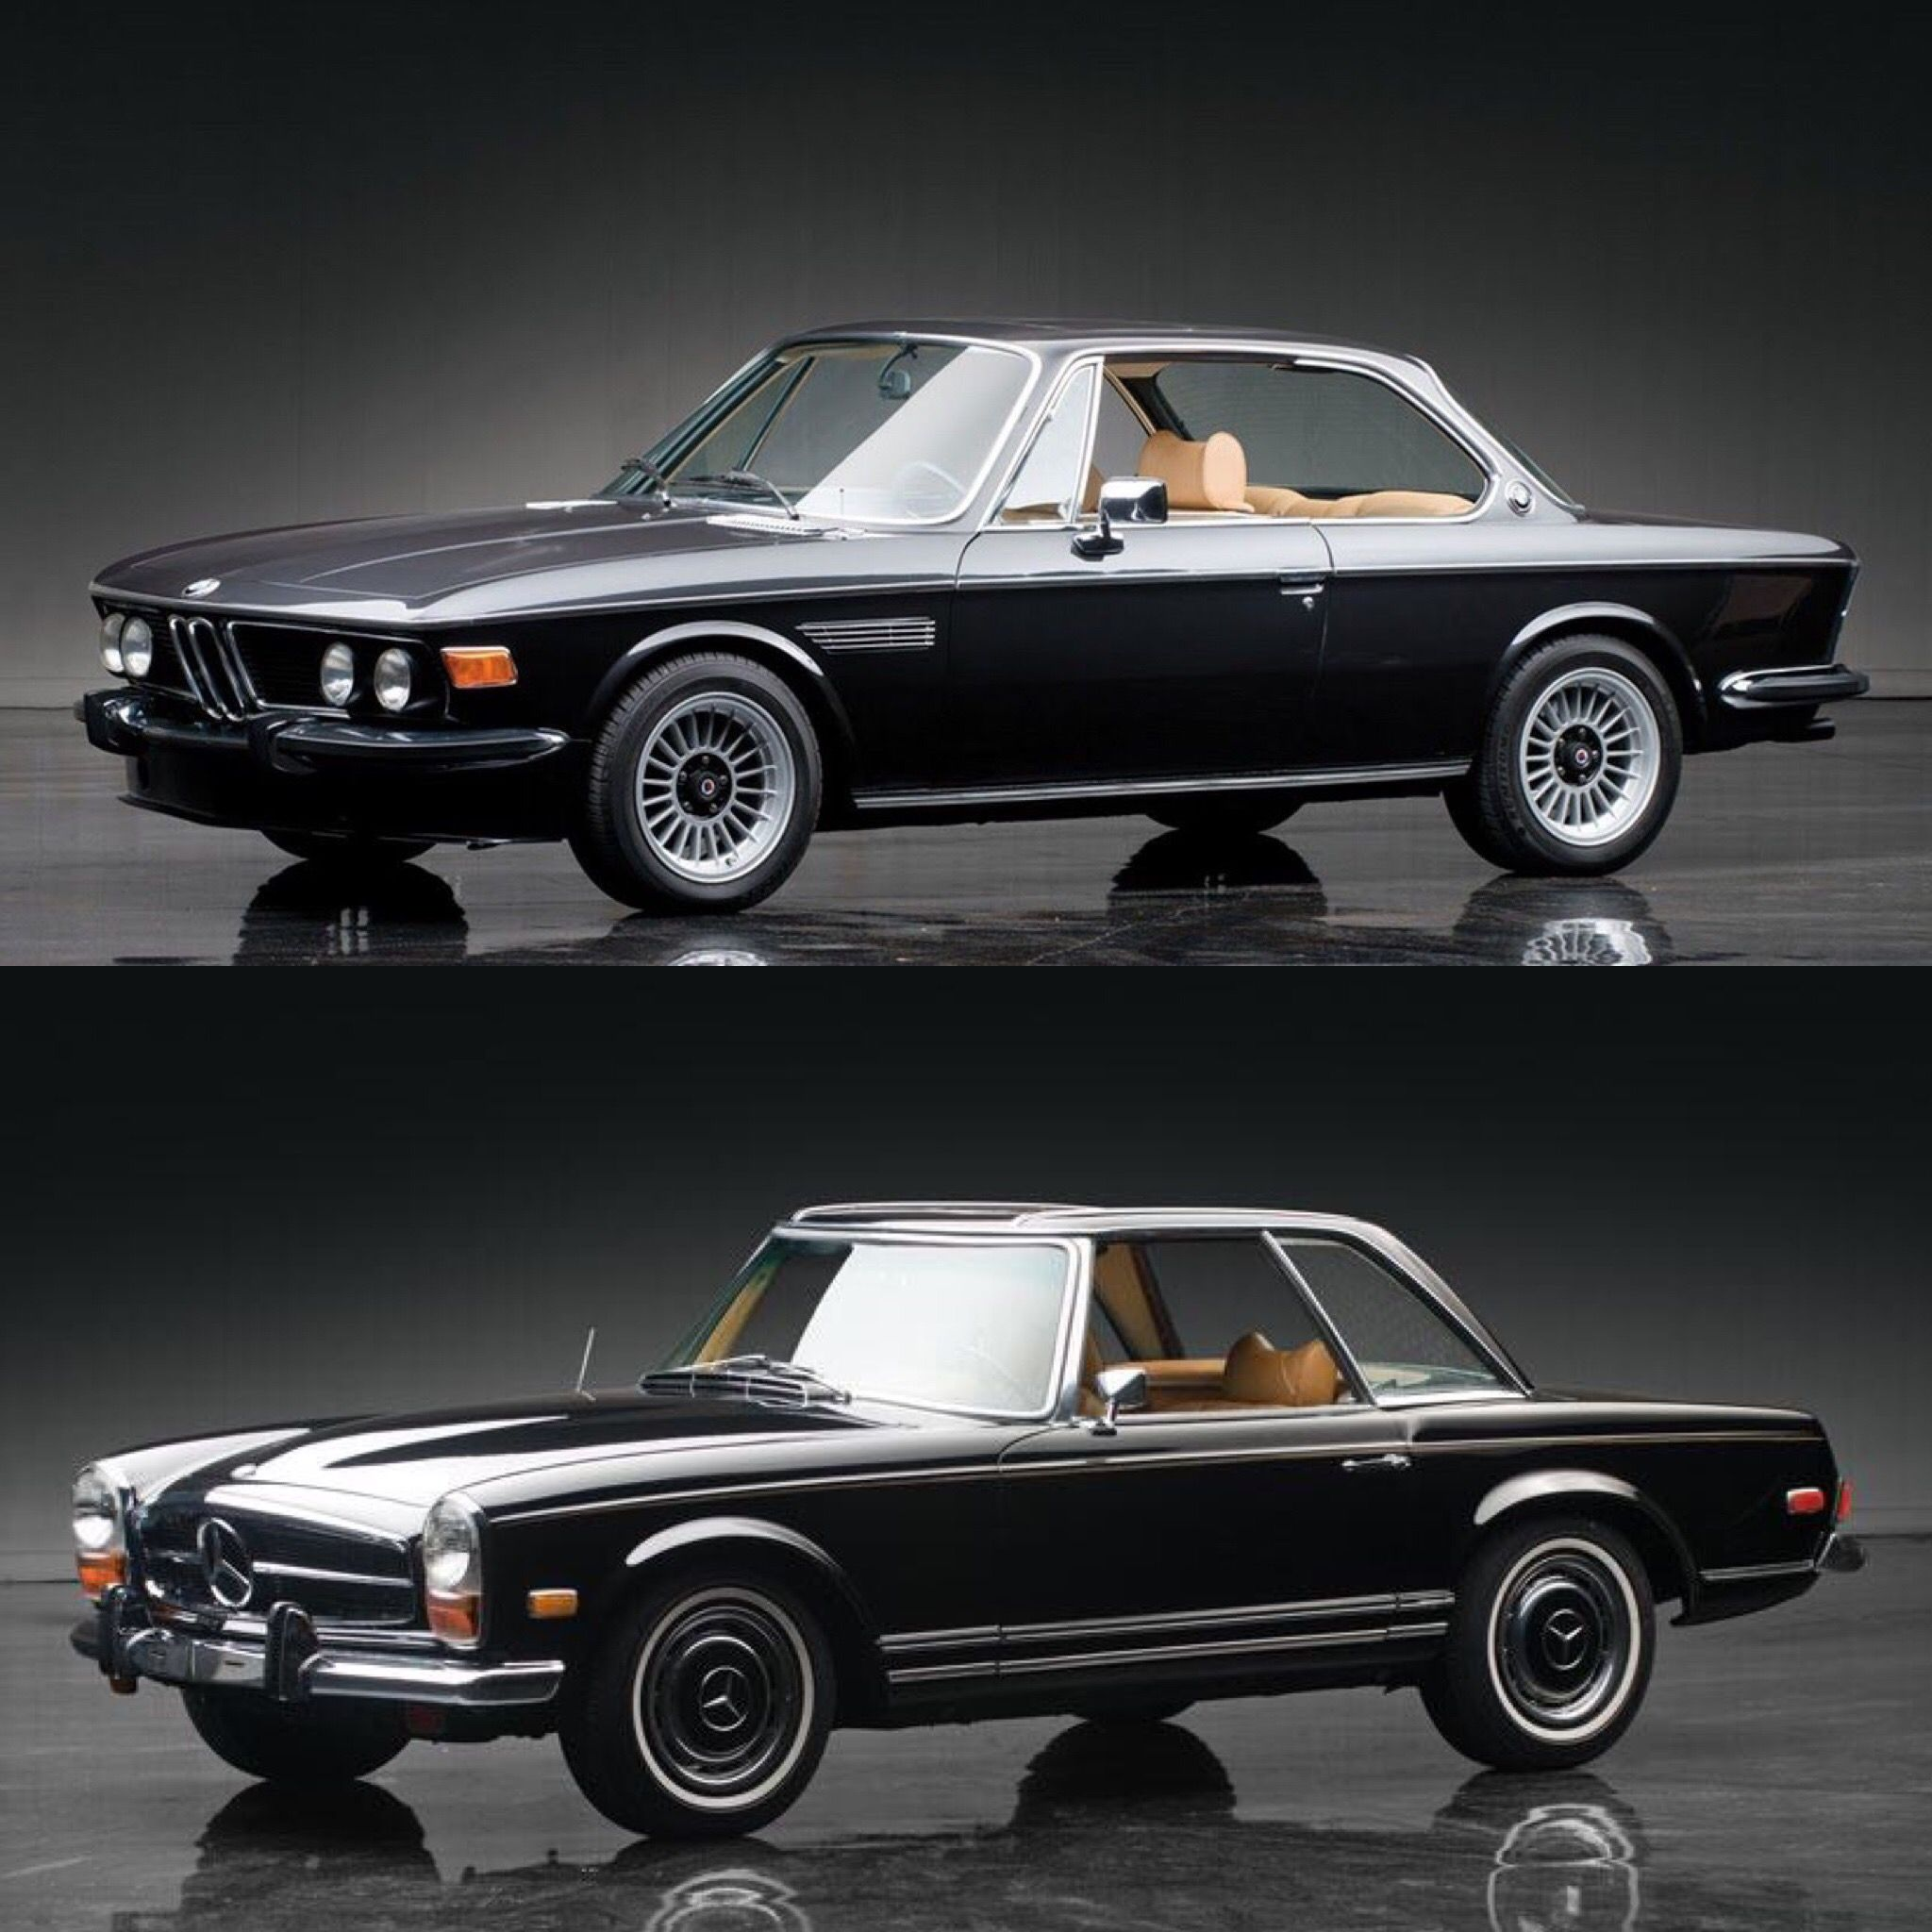 Classic Car Face Off: BMW 3.0 CS Coupe vs Mercedes-Benz 280SL Pagoda